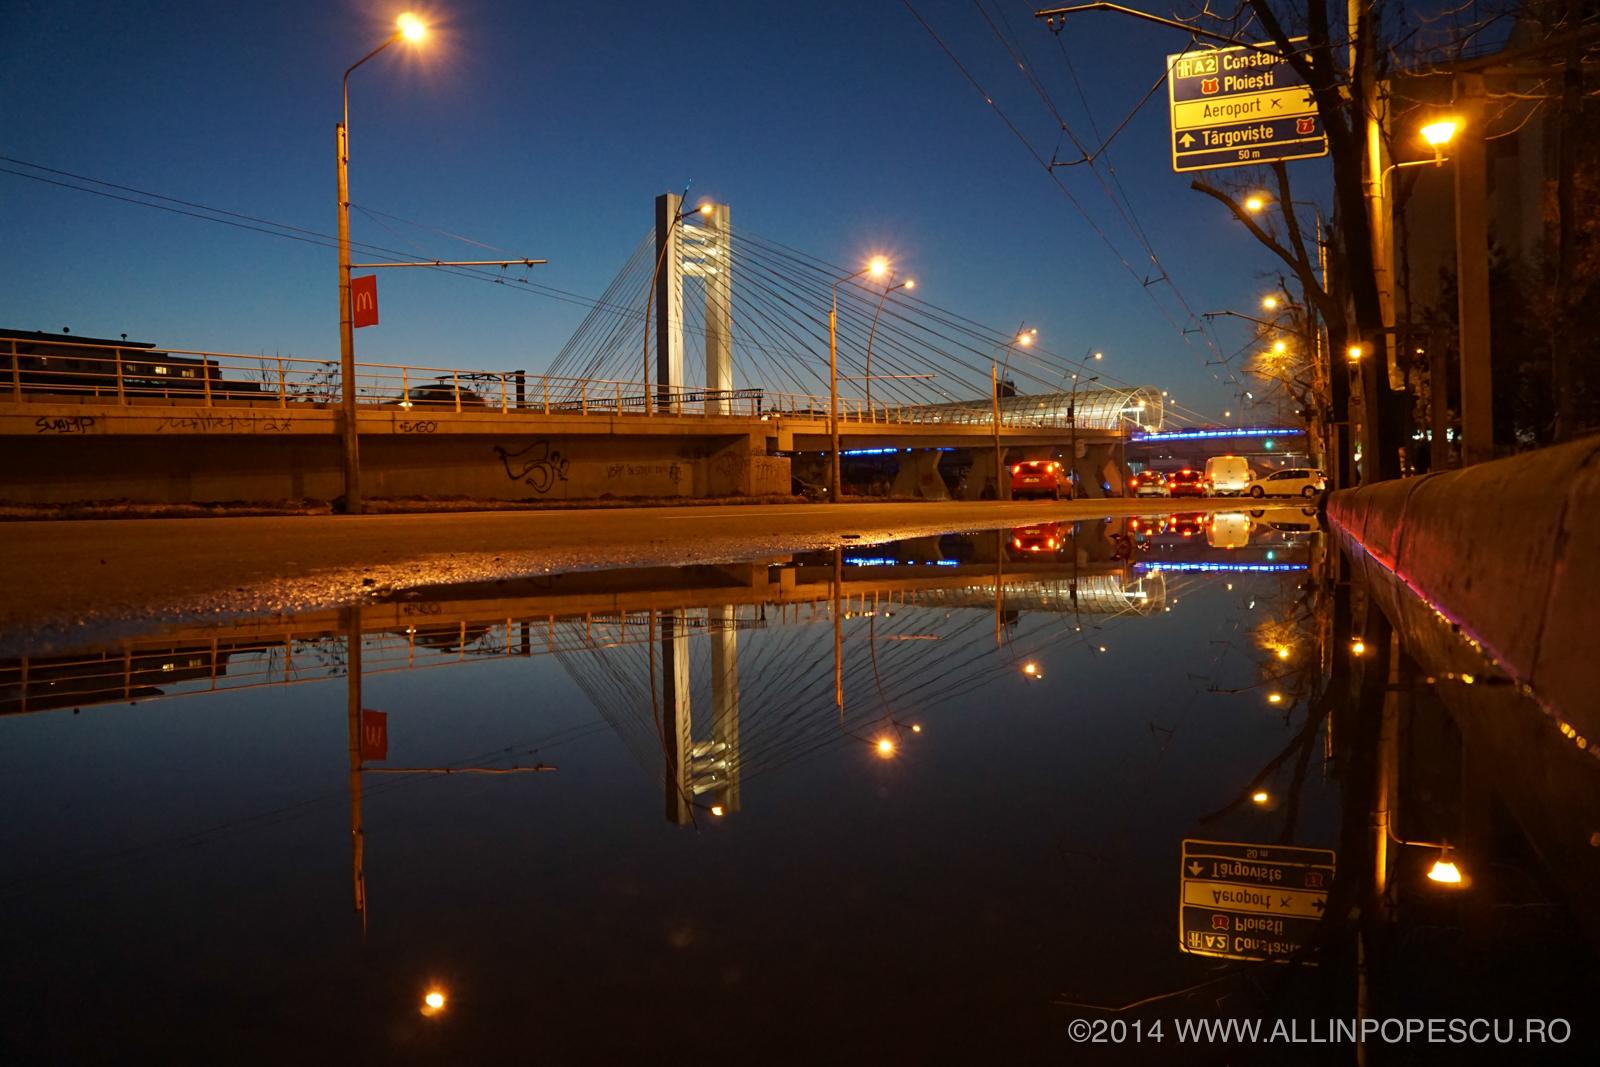 sony 16 70. carl zeiss 16-70 f4 | 16 mm f6 1/60 s iso 3200 mfnr handheld twilight scene sony 70